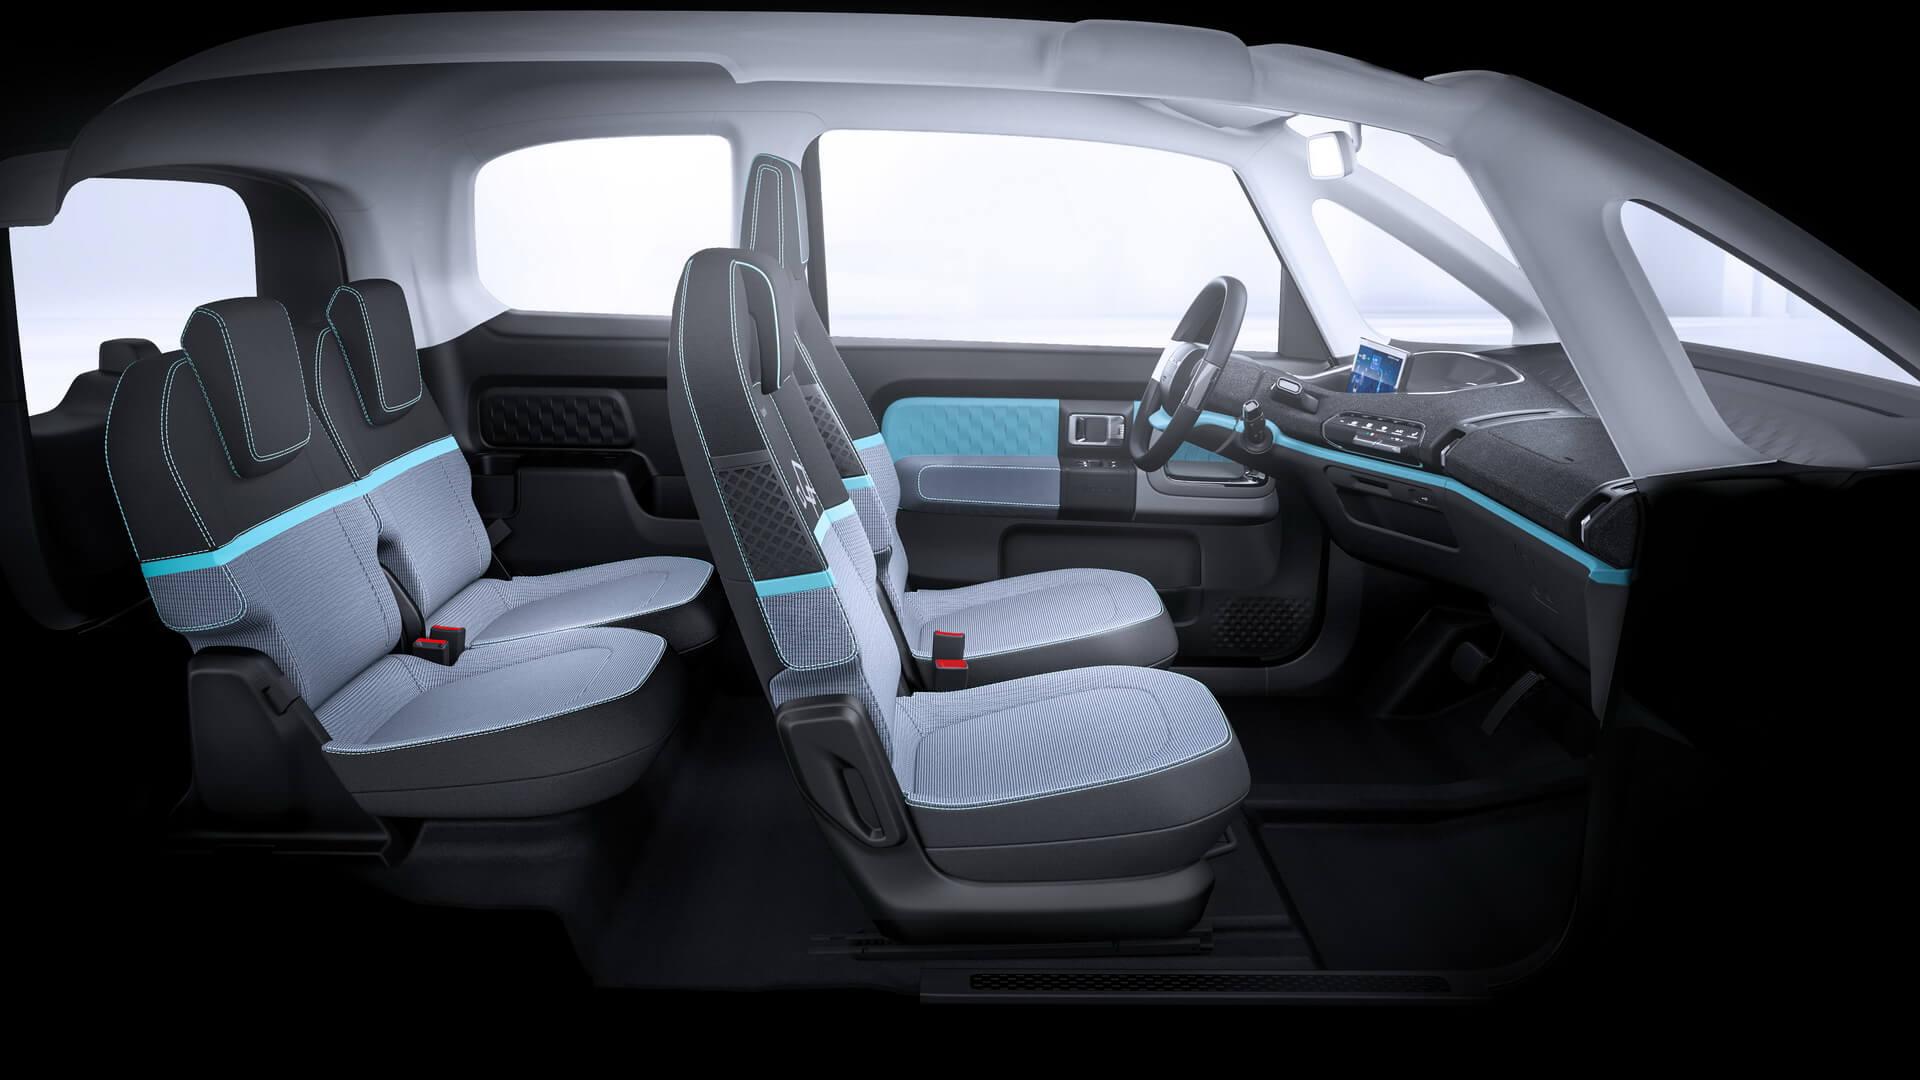 Салон компактного электромобиля Baojun E300 PLUS для китайского рынка